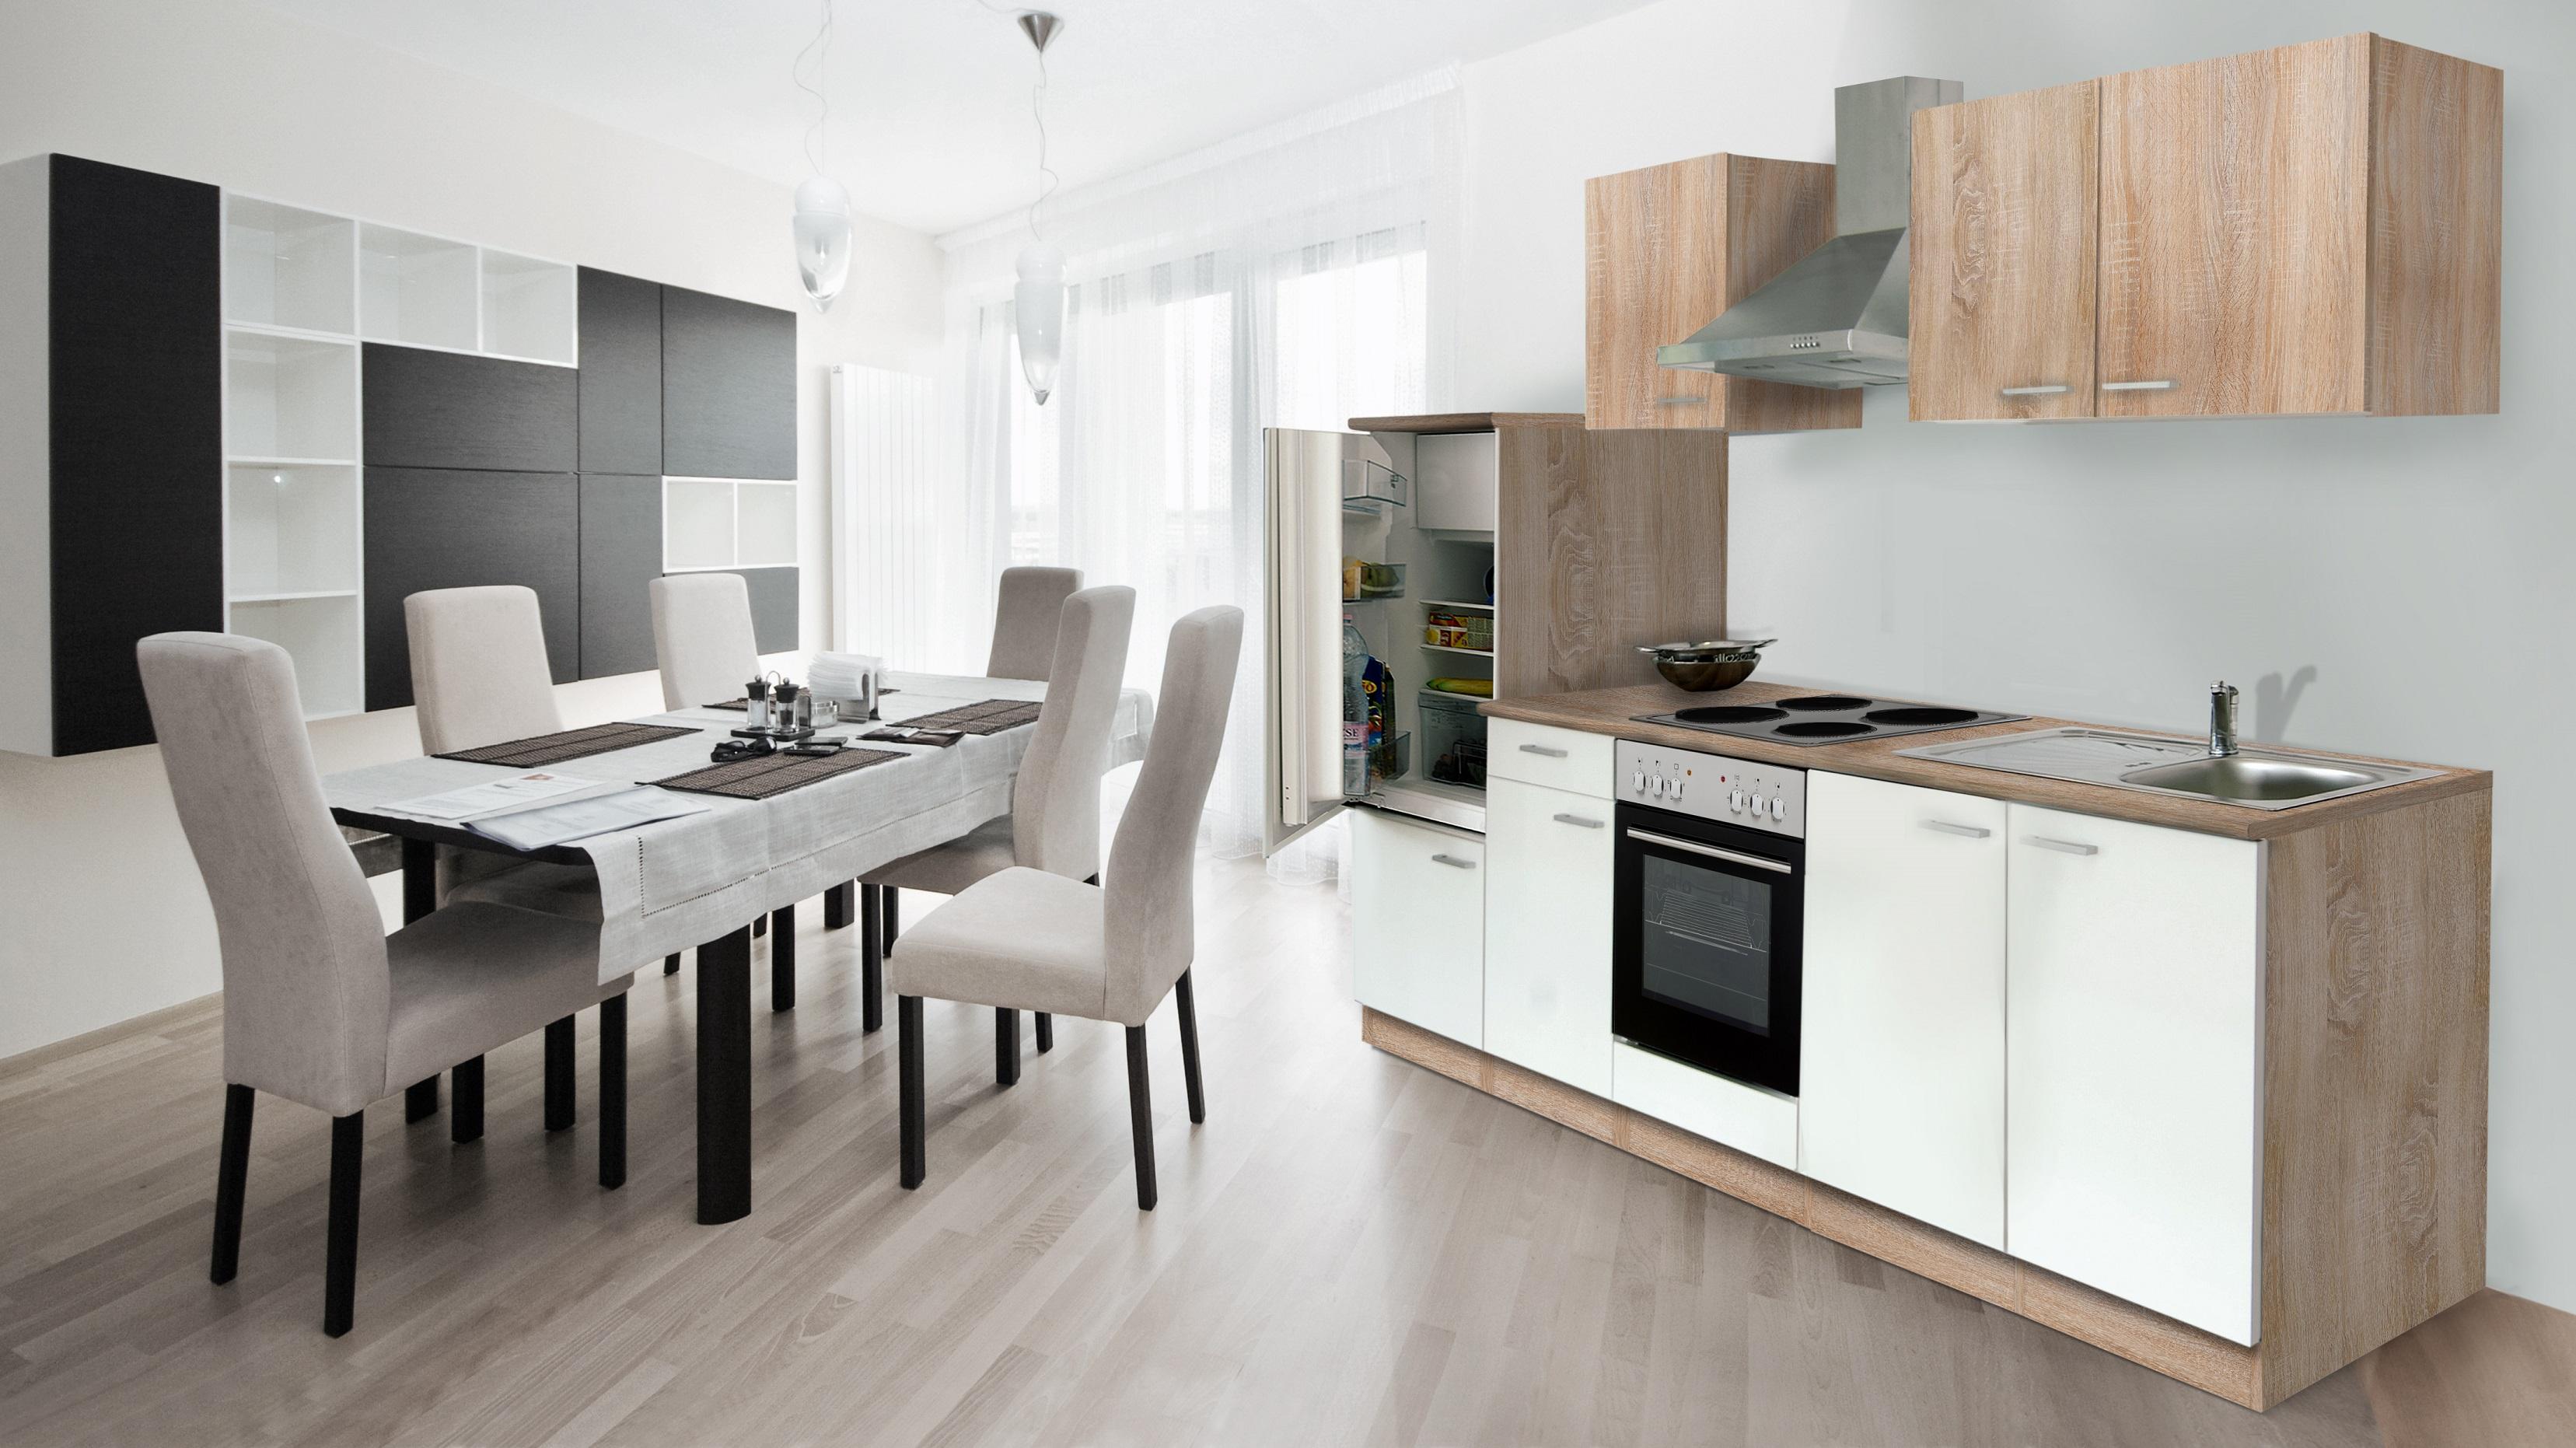 RESPEKTA incasso BLOCCO cucina cucina angolo cottura 270 cm | eBay